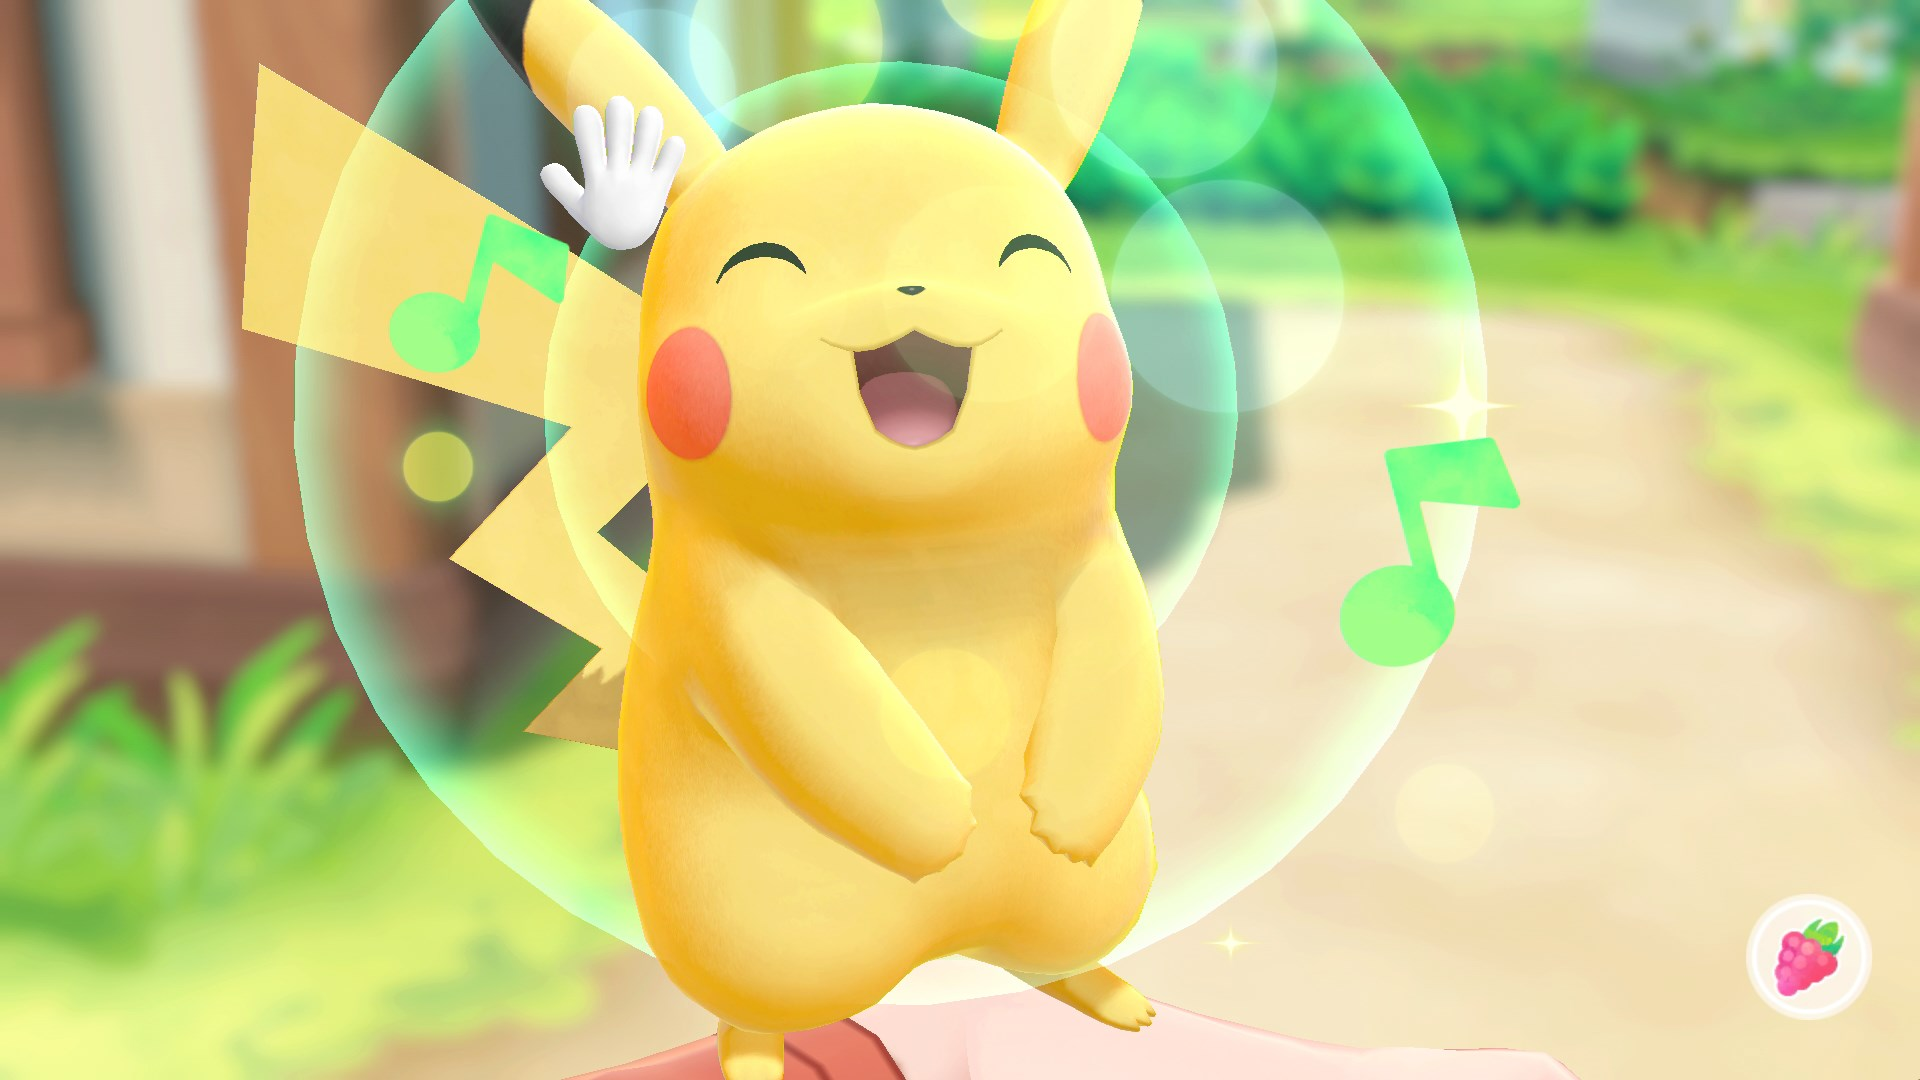 Will Pokémon Let's Go Convert Pokémon Go Players?